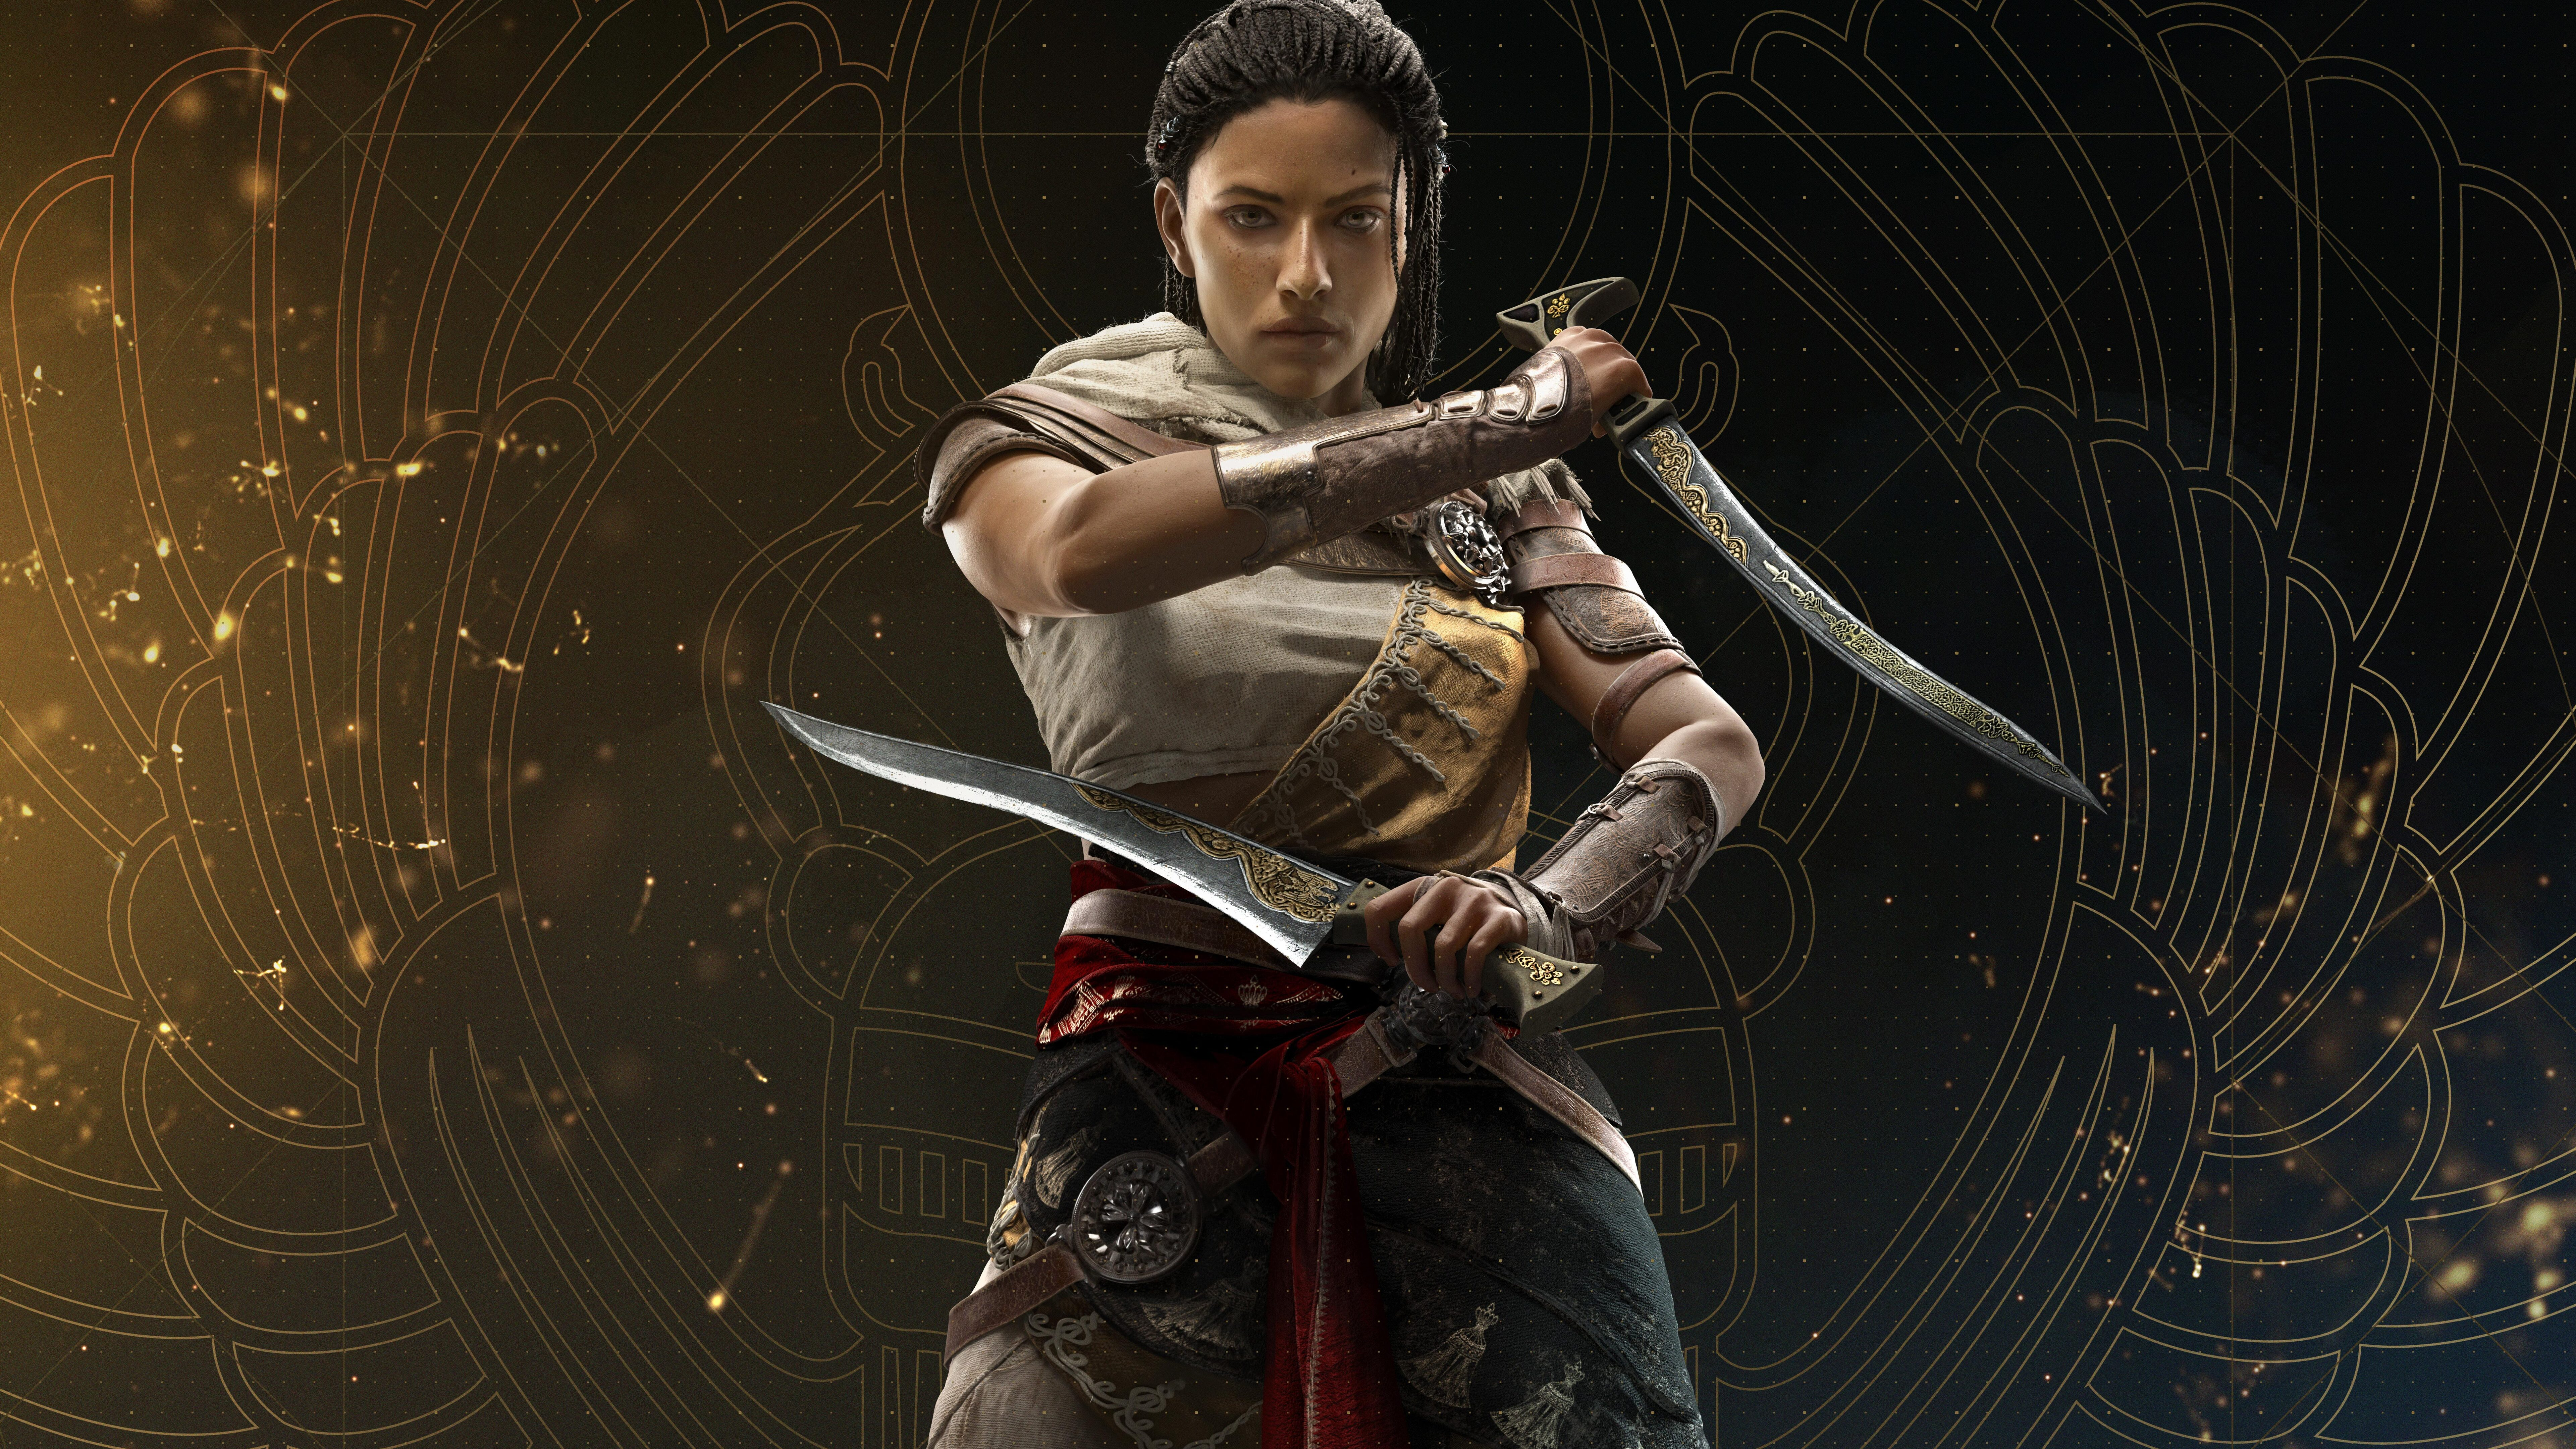 7680x4320 Aya Assassins Creed Origins 8k 8k Hd 4k Wallpapers